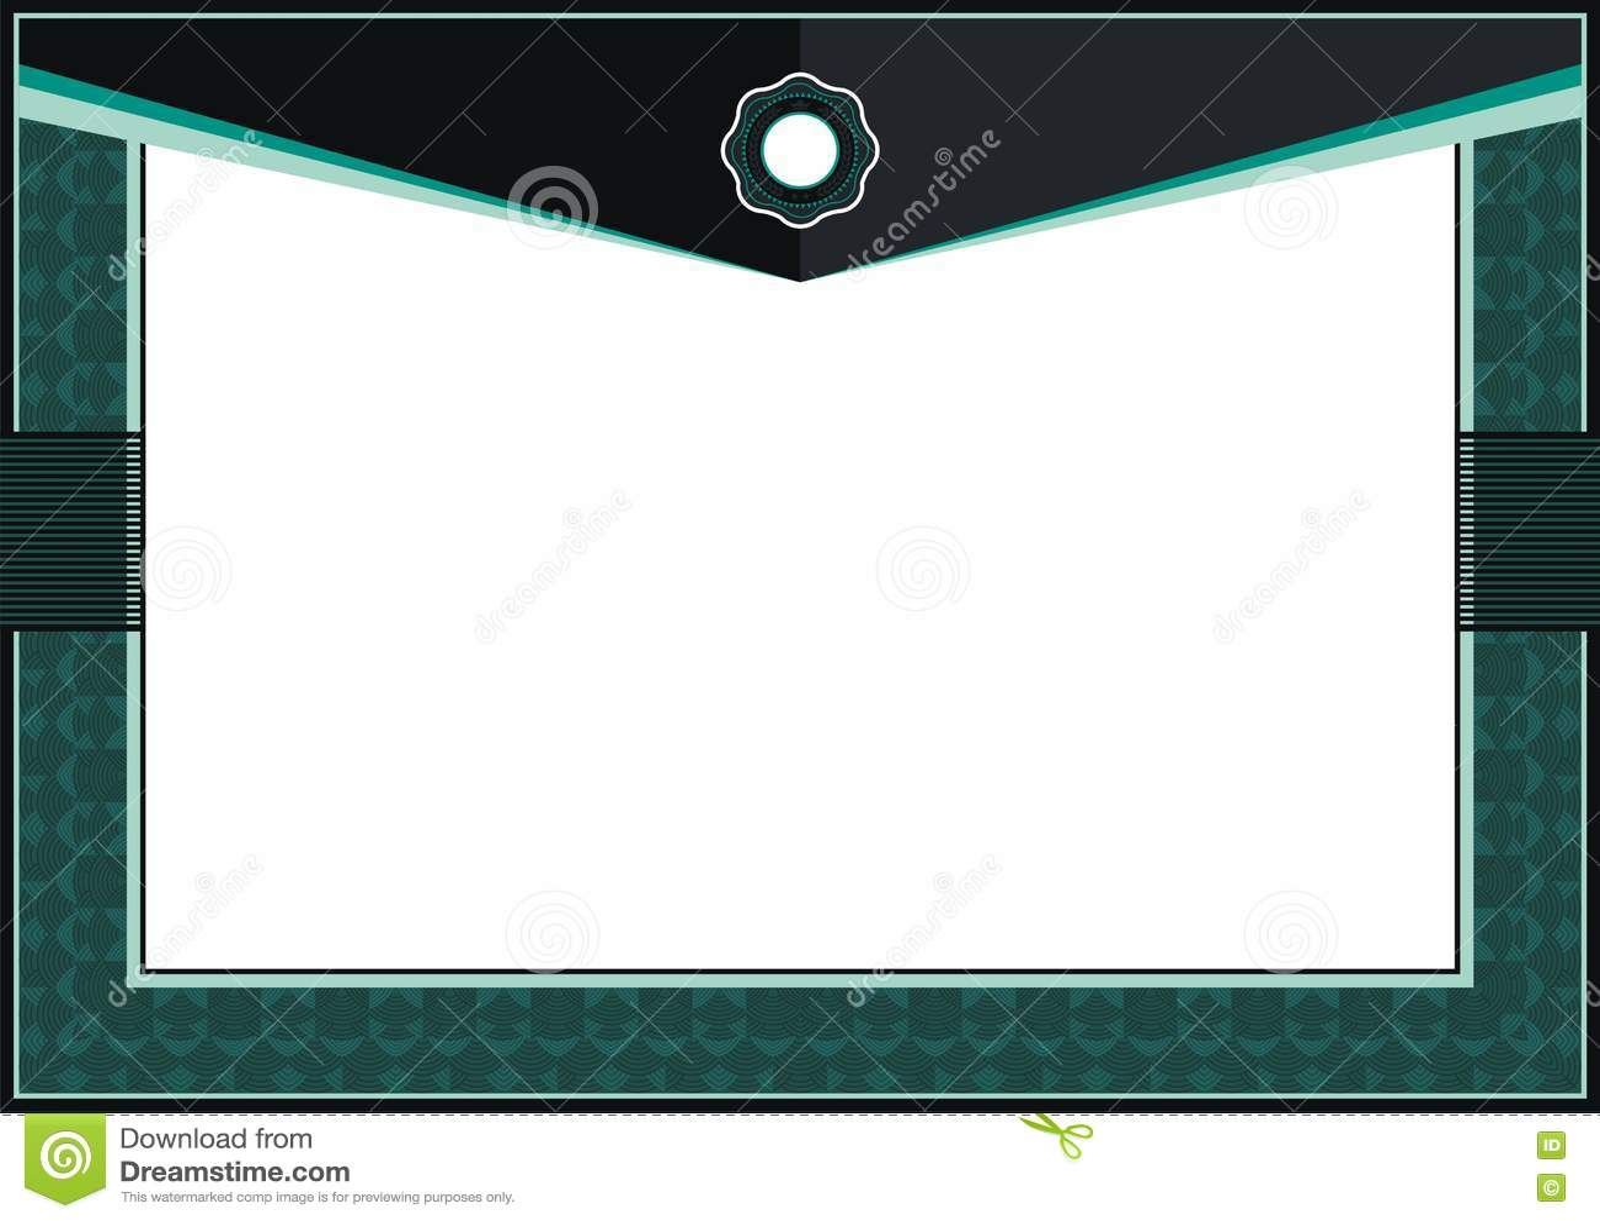 - Quadro verde do molde do certificado ou do diploma - beira escura